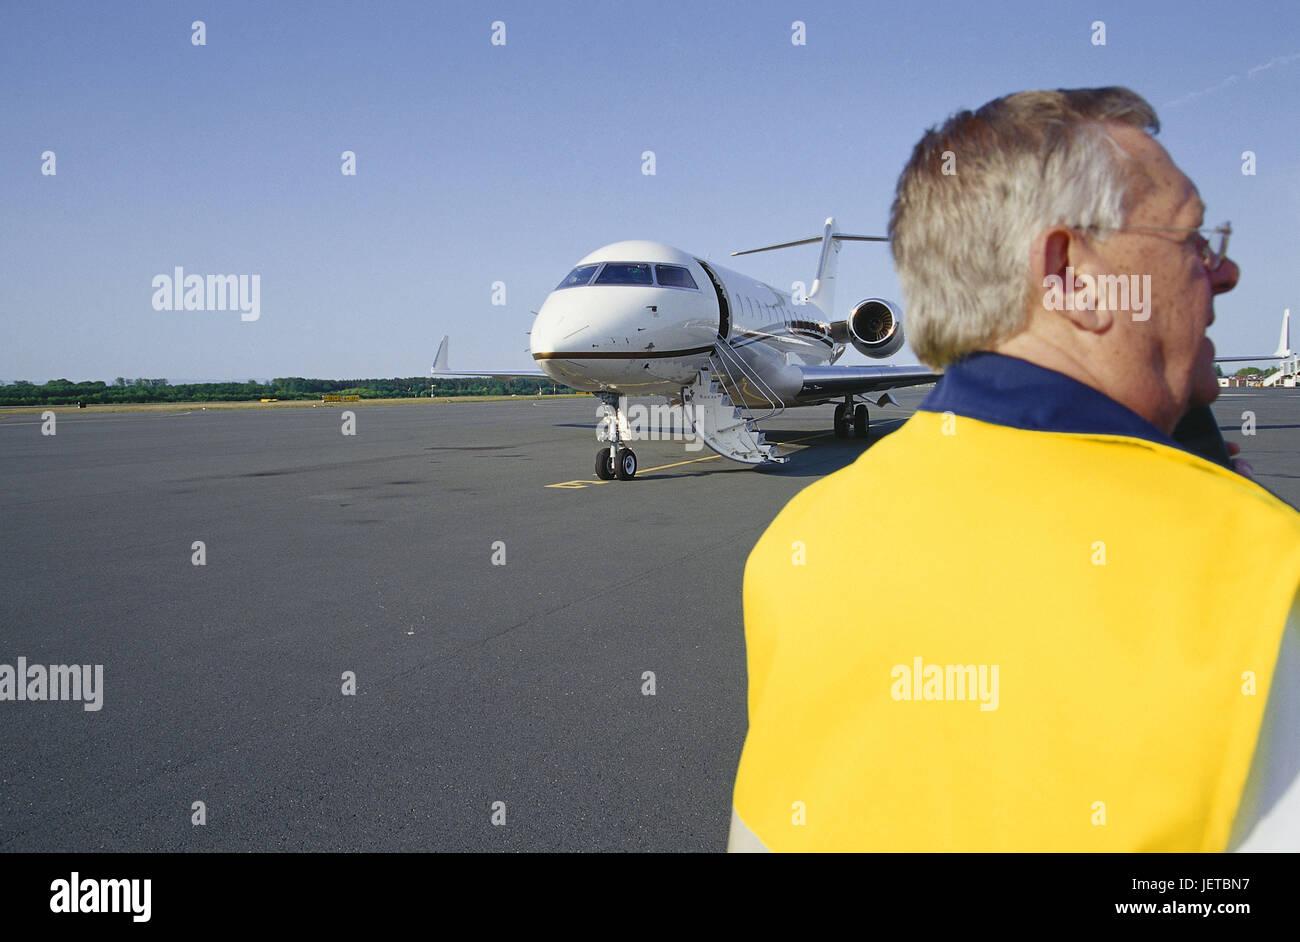 Germany, North Rhine-Westphalia, Paderborn-Lippstadt, airport, man, landing field, airplane, Teutoburger wood, Paderborn, - Stock Image